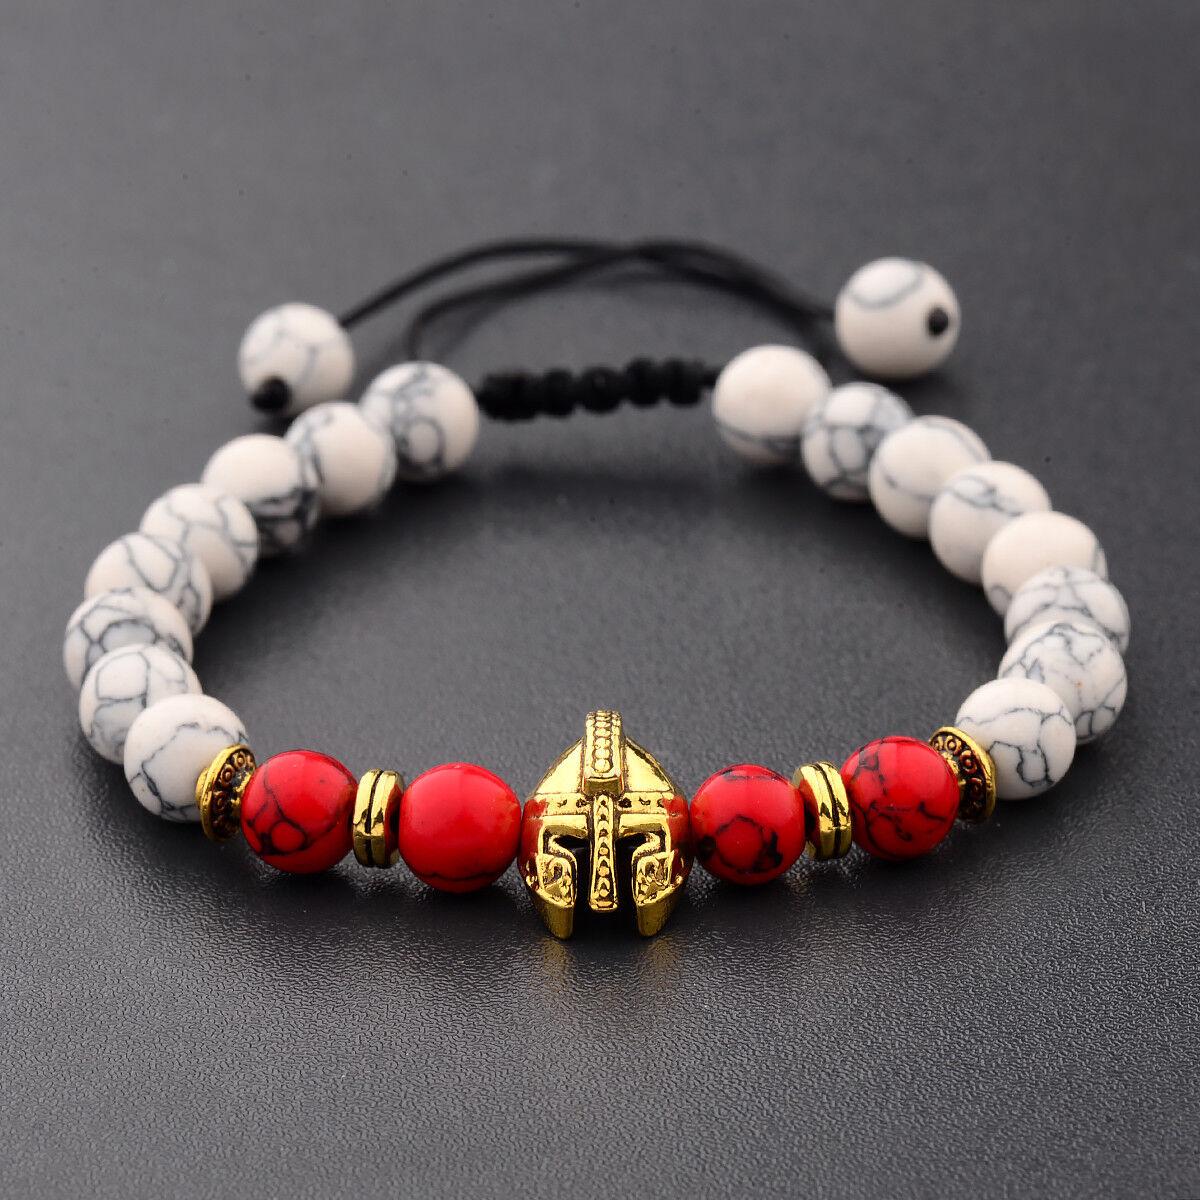 1Pcs Men Women 8MM Gemstone Beaded Braided Bracelets Charm Fashion Jewelry Gift 5